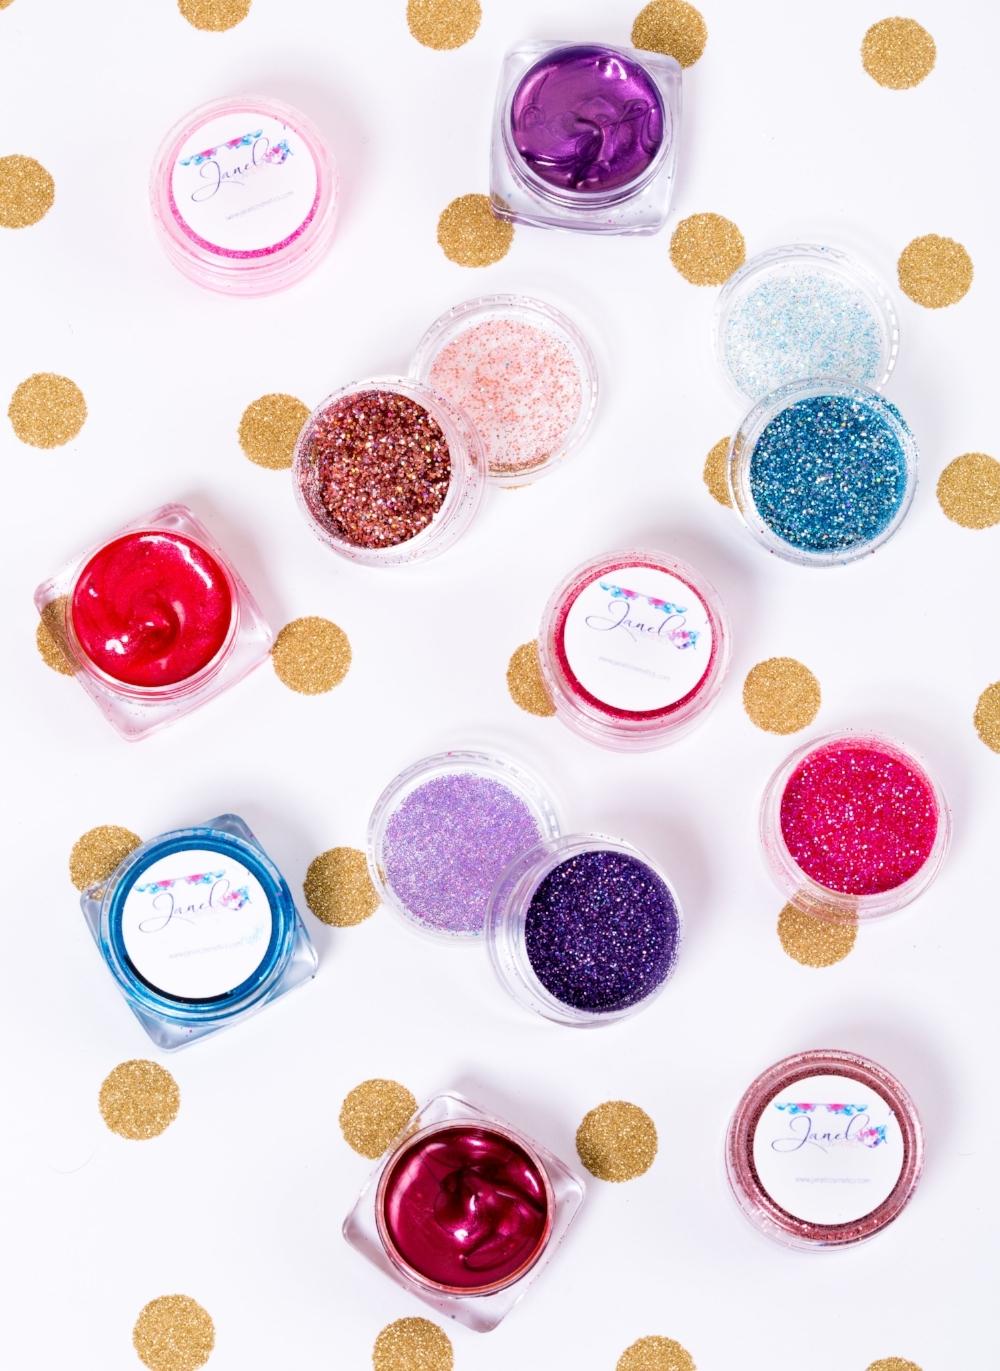 Janel Cosmetics.jpg